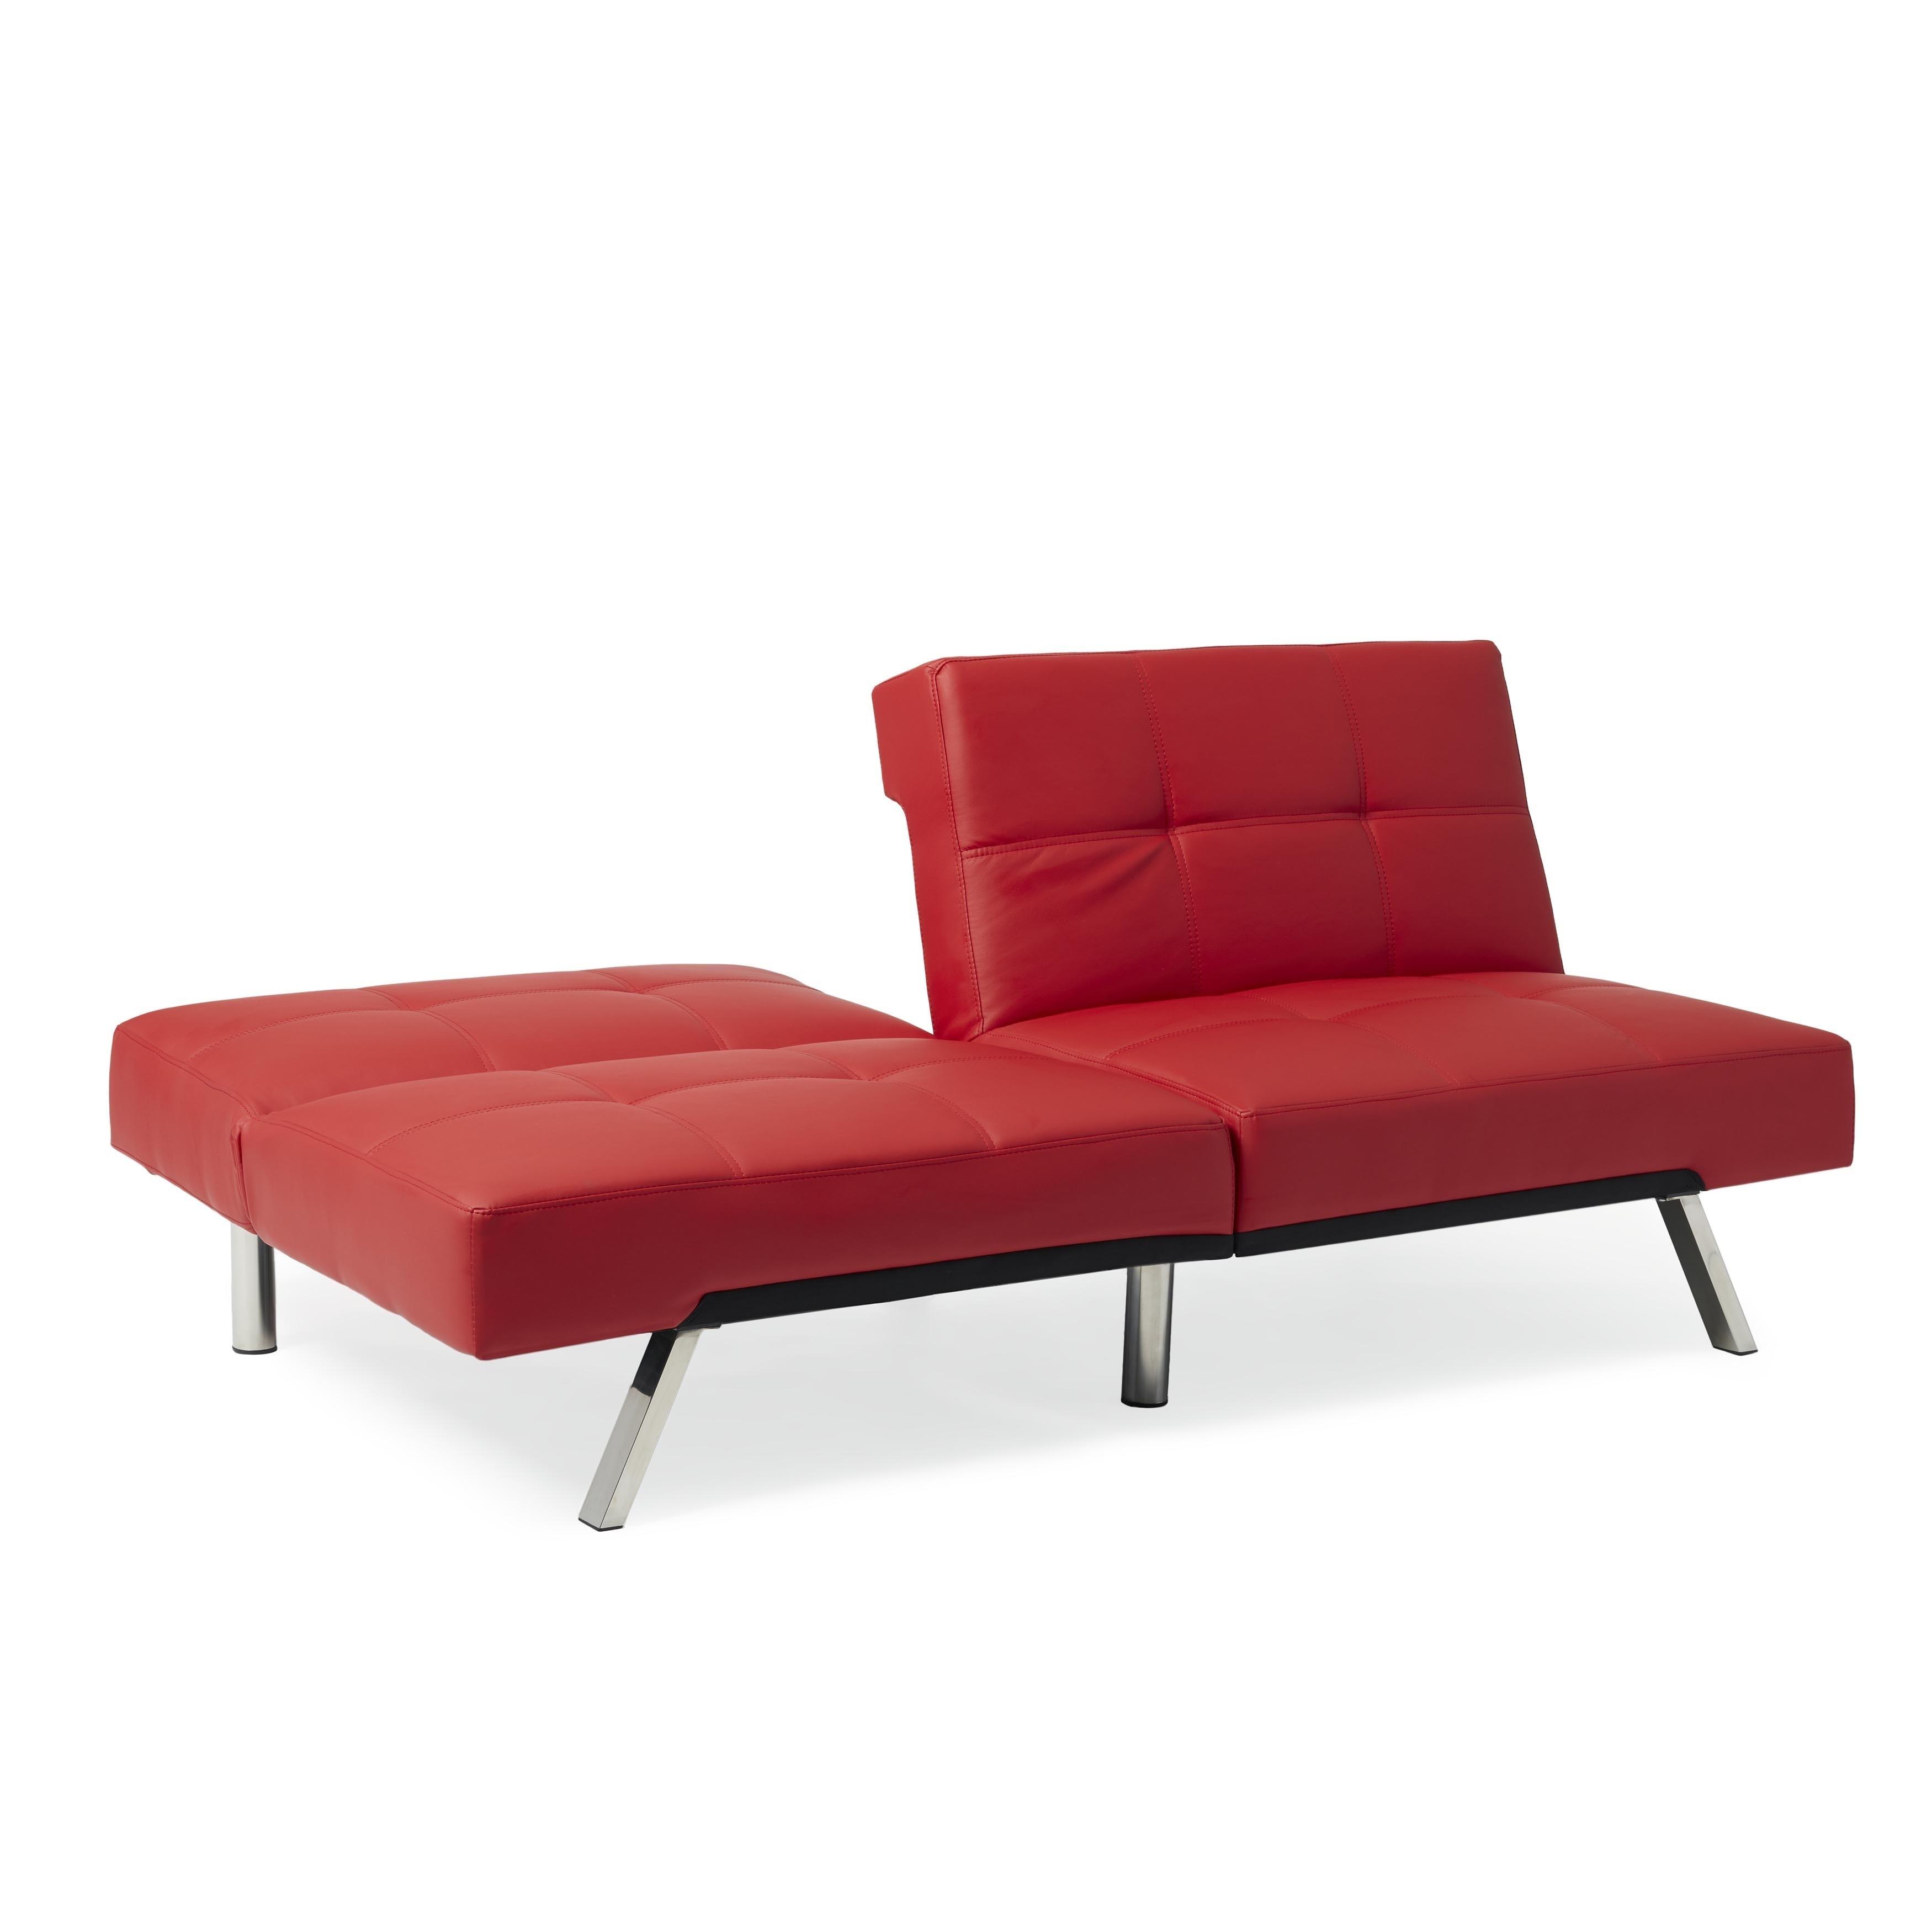 Abbyson Aspen Red Bonded Leather Foldable Futon Sleeper Sofa